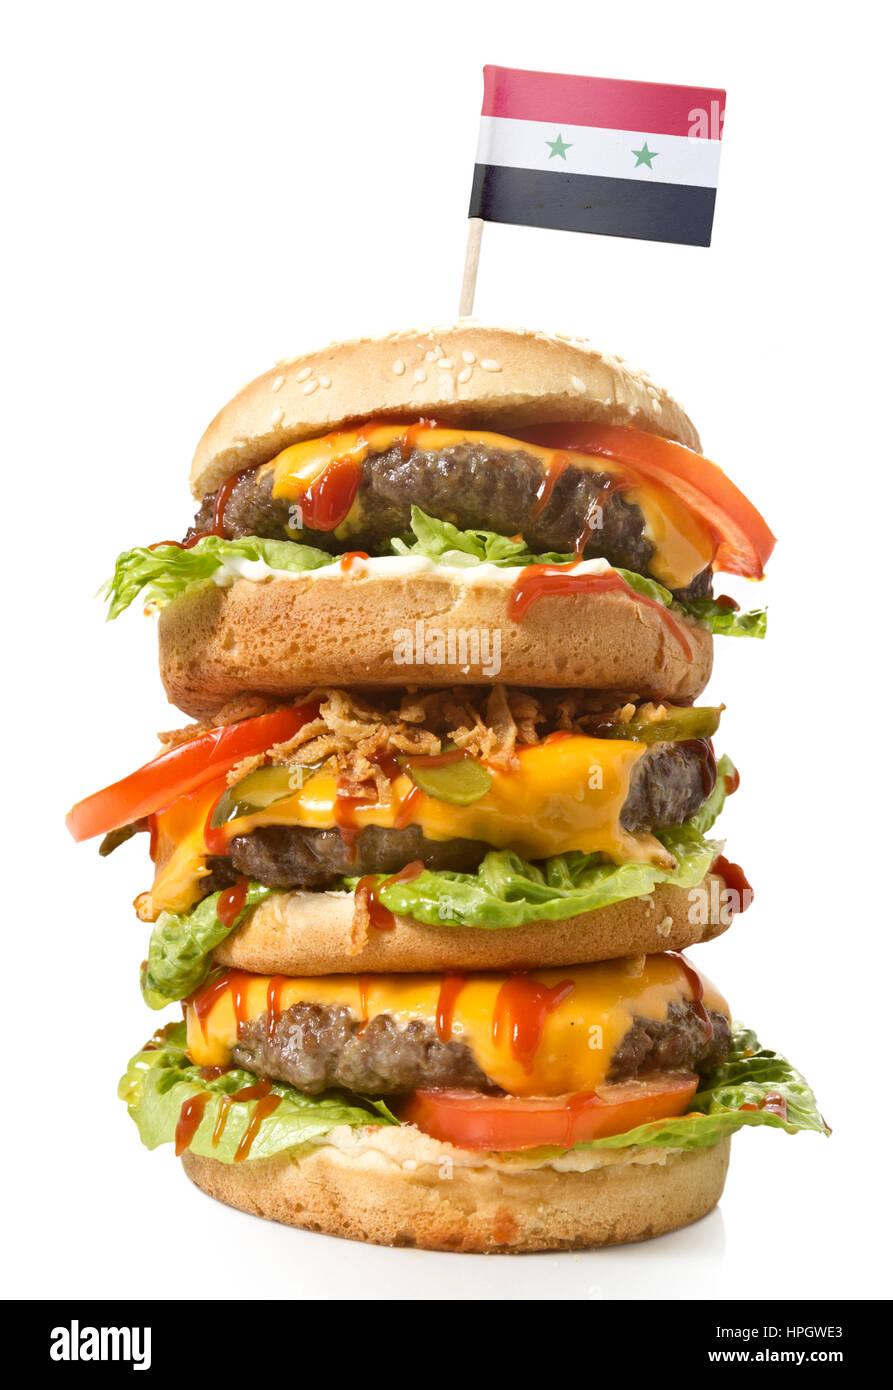 hamburger flag stockfotos hamburger flag bilder alamy. Black Bedroom Furniture Sets. Home Design Ideas